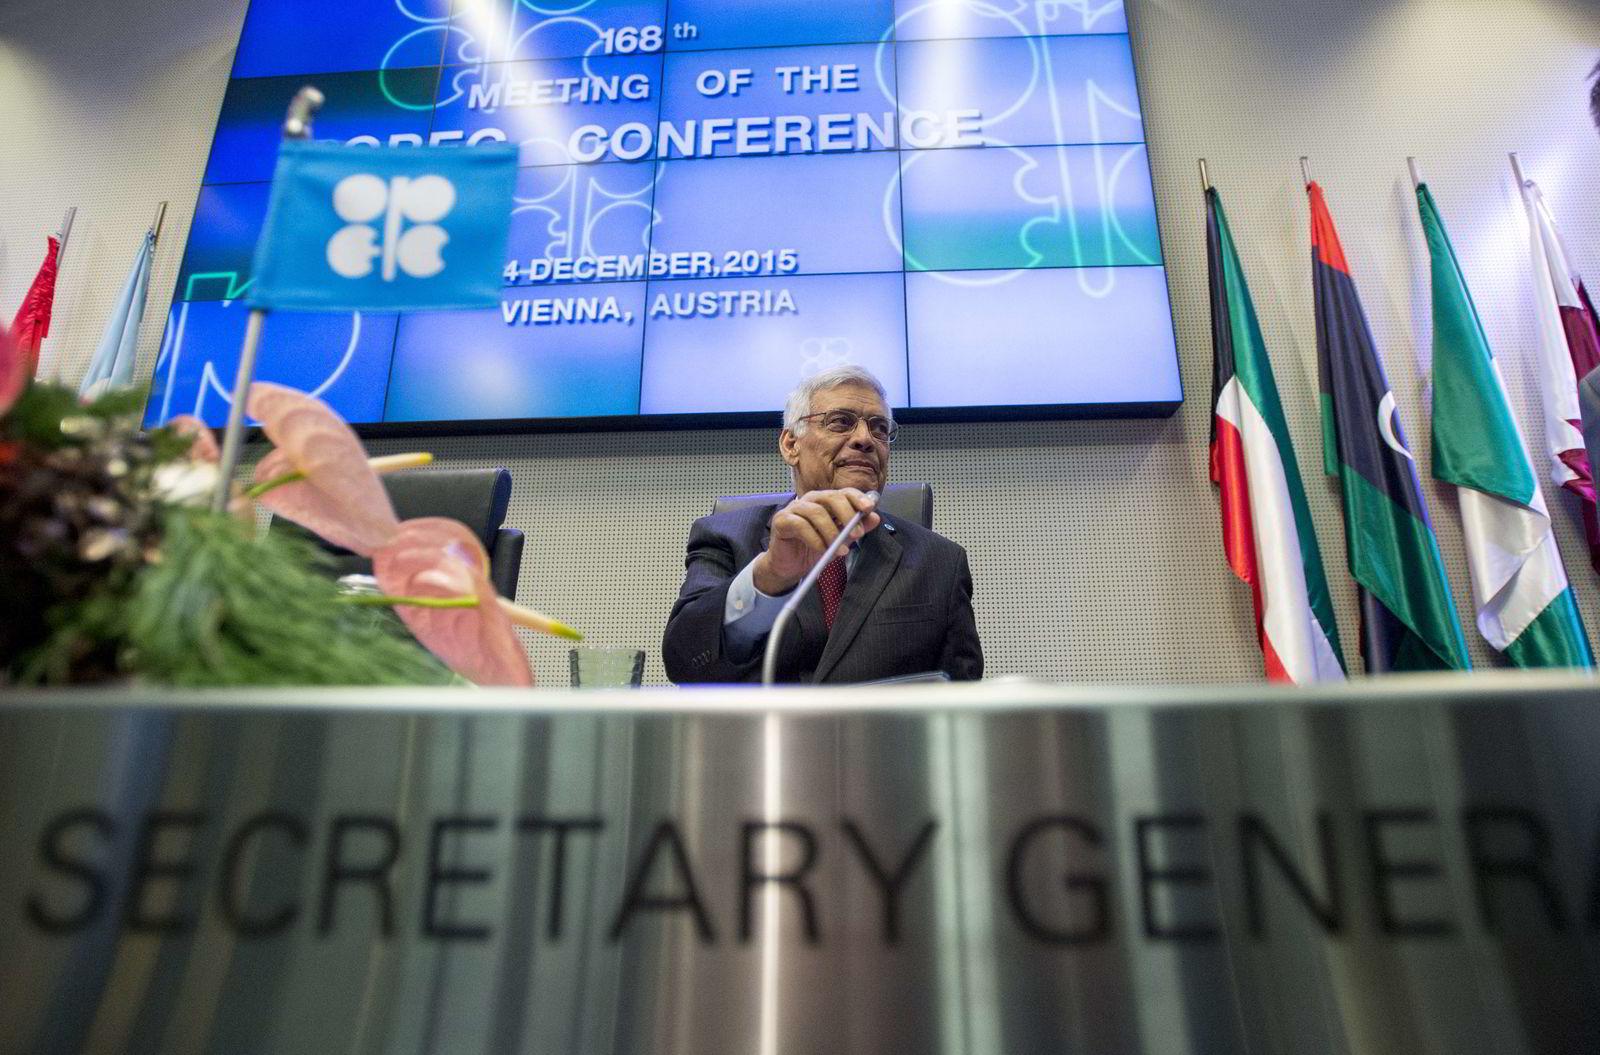 Opec-sjef Abdalla Salem el-Badri avbildet under det forrige offisielle Opec-møtet i desember. Foto: AFP PHOTO / JOE KLAMAR / NTB Scanpix